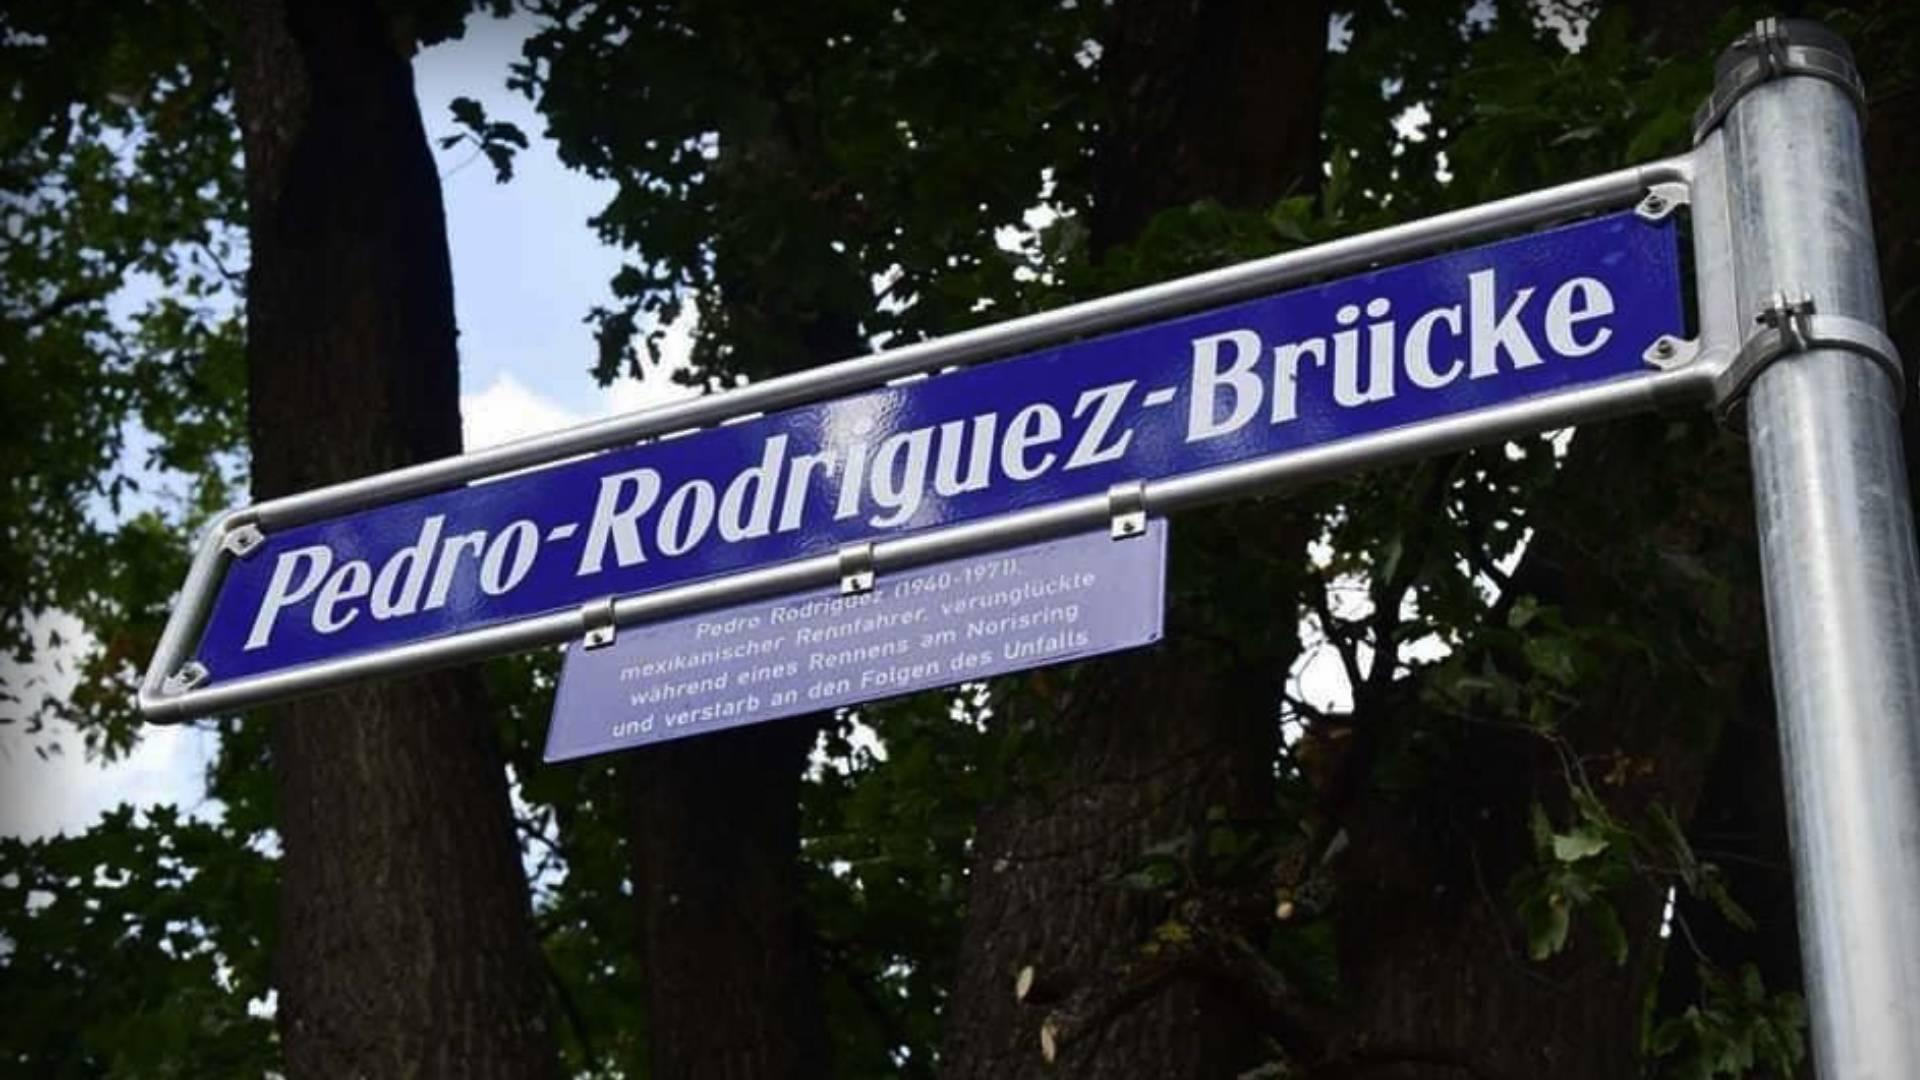 calle-pedro-rodriguez-en-nuremberg-alemania.jpg